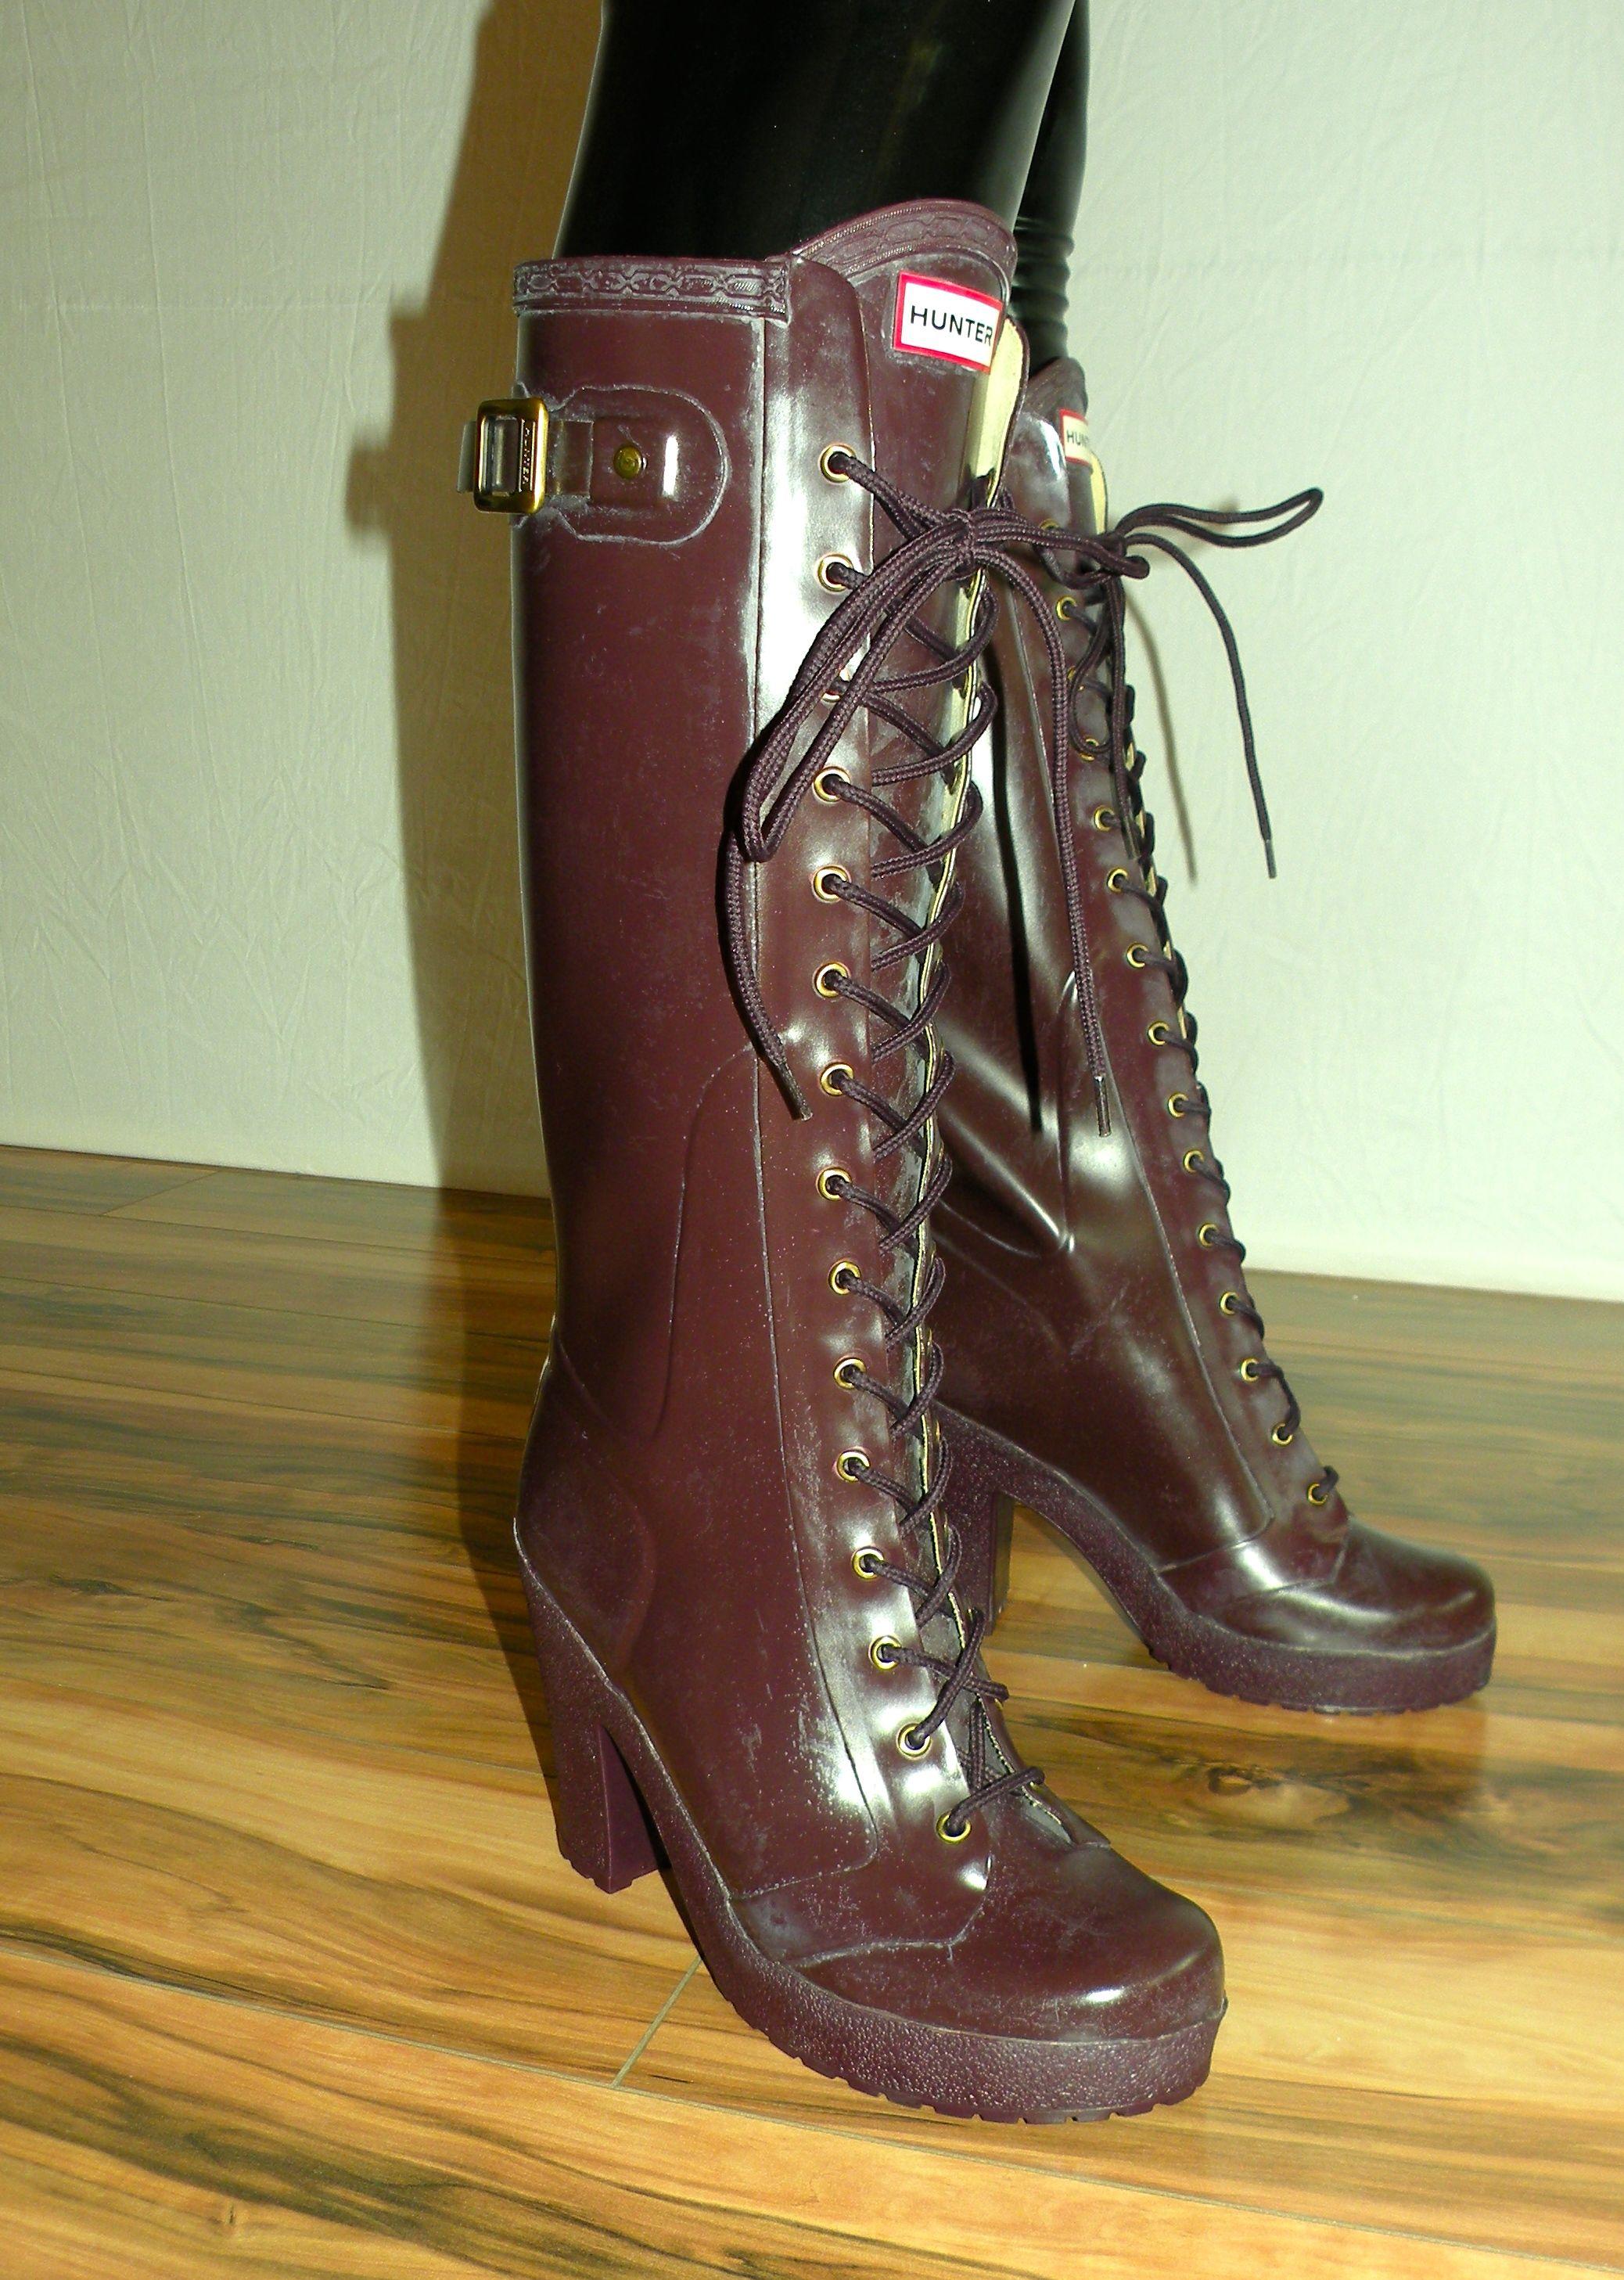 2018 Schuhe wie man serch heiß-verkauf echt Pin von Torok Csaba auf Women rubber high heel boots & women ...